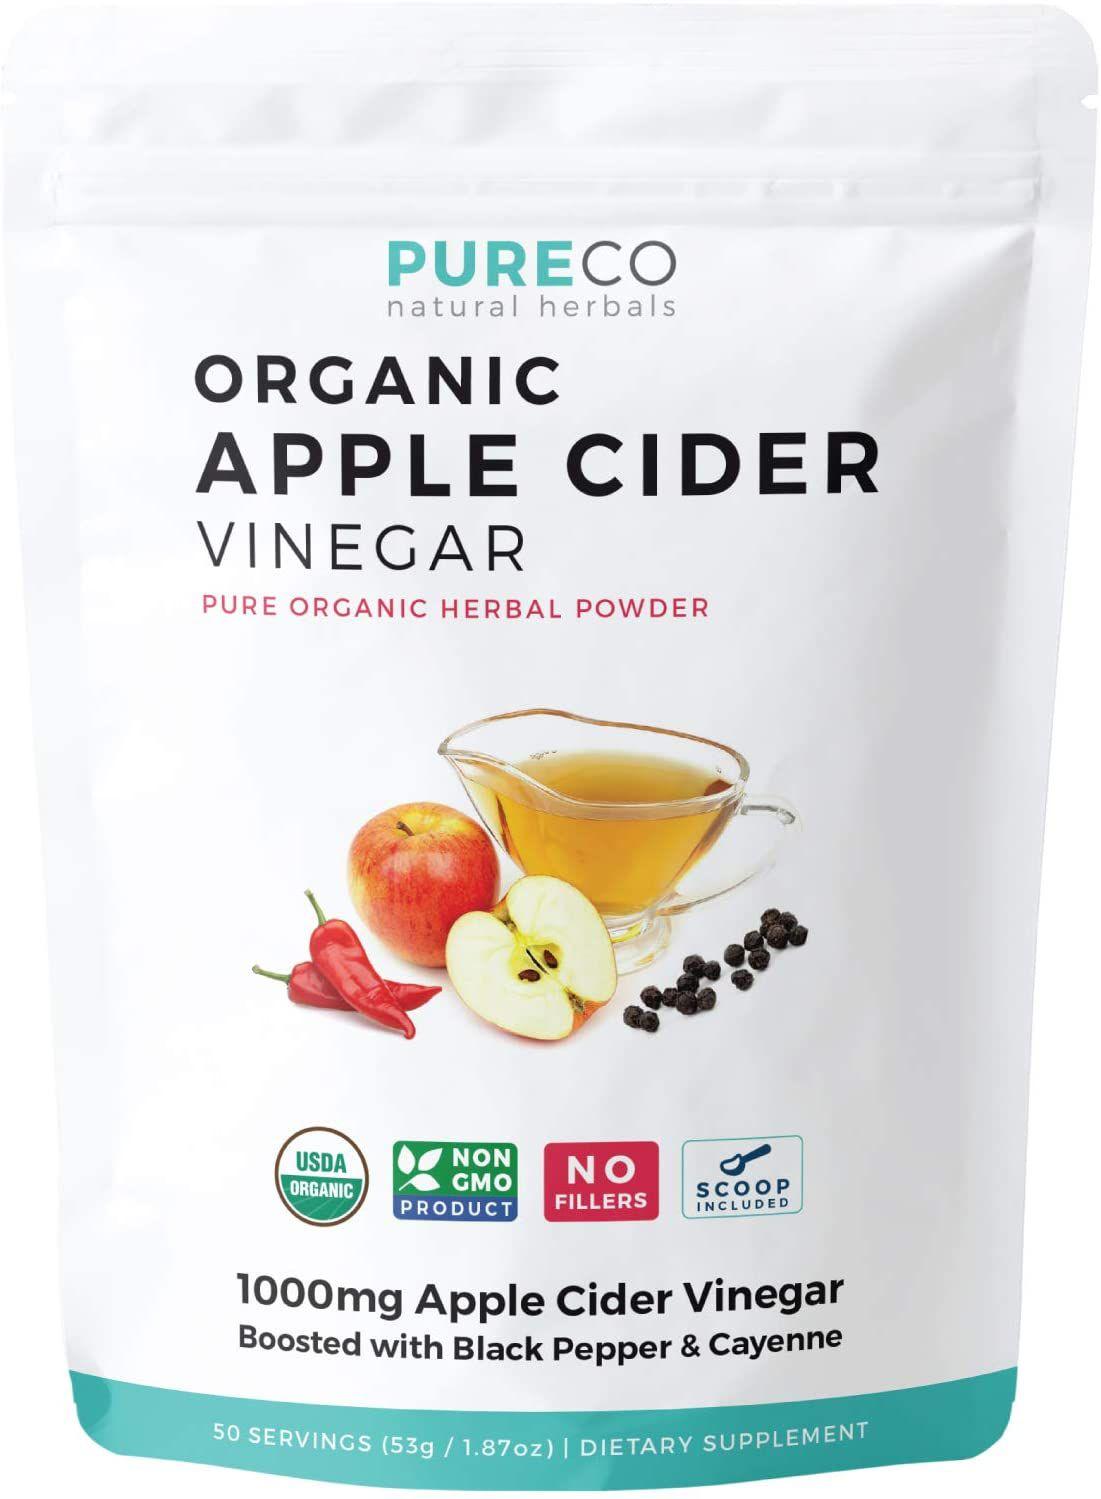 Pure Co. Organic Apple Cider VInegar Powder